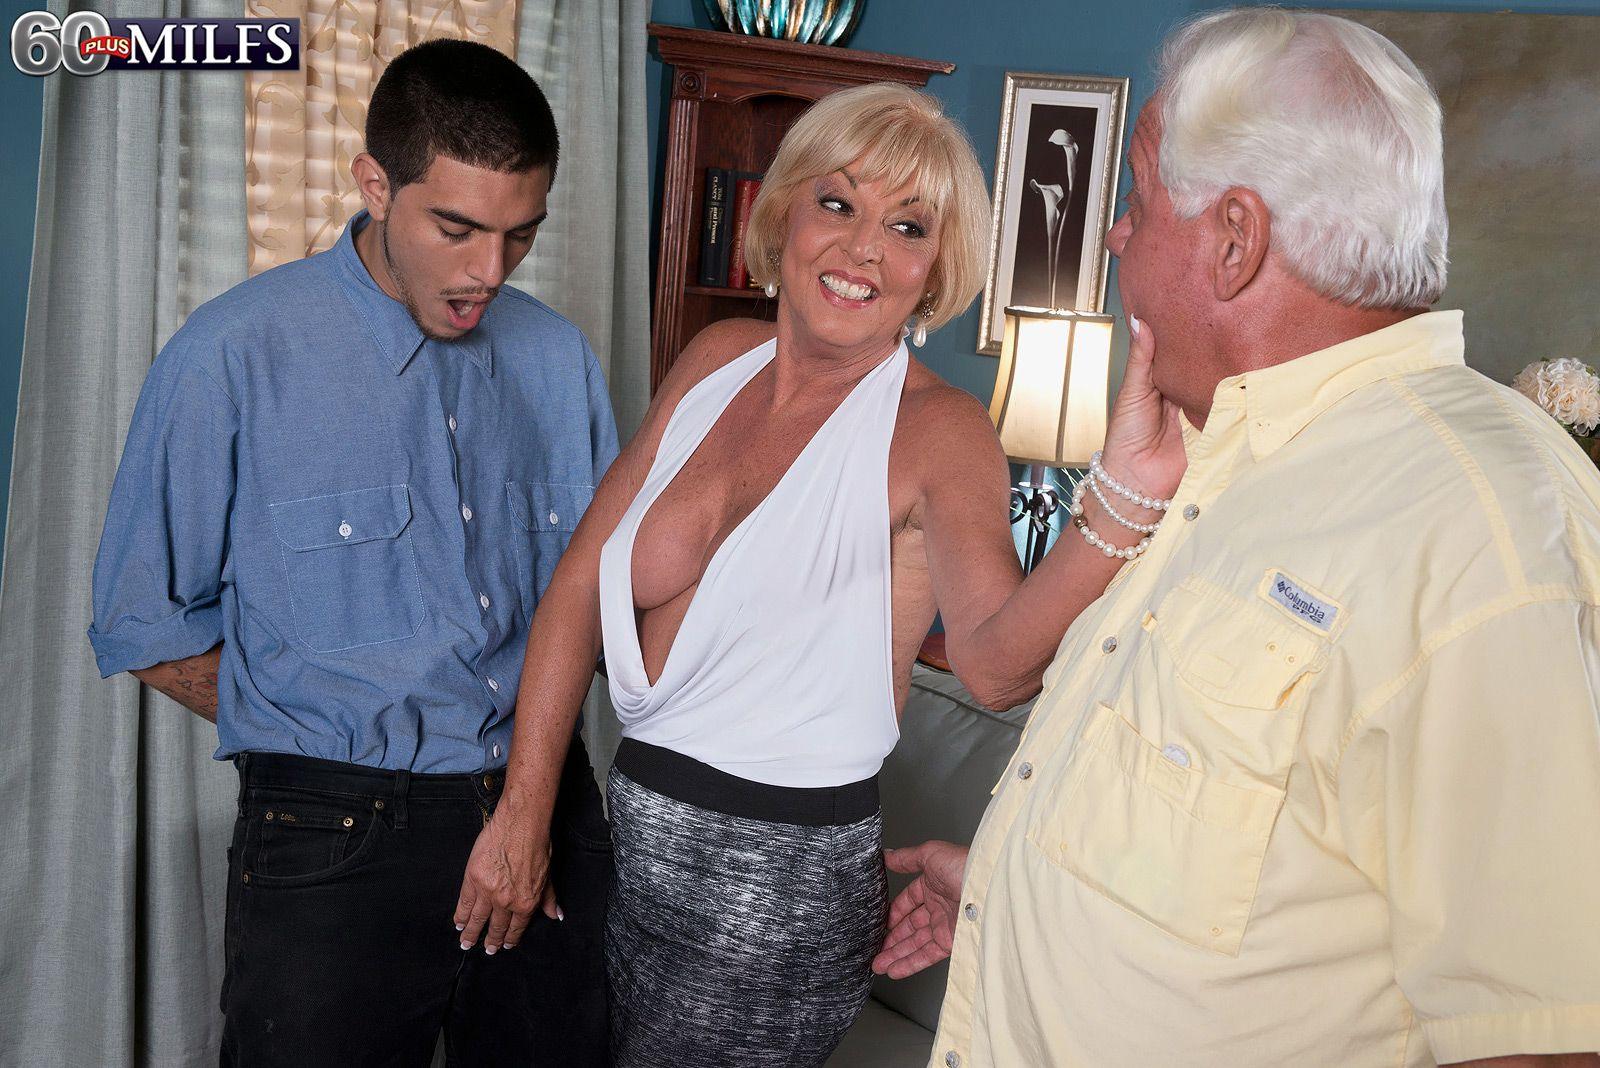 Buxom blonde granny over 60 Scarlett Andrews sucking dick in front of cuckold